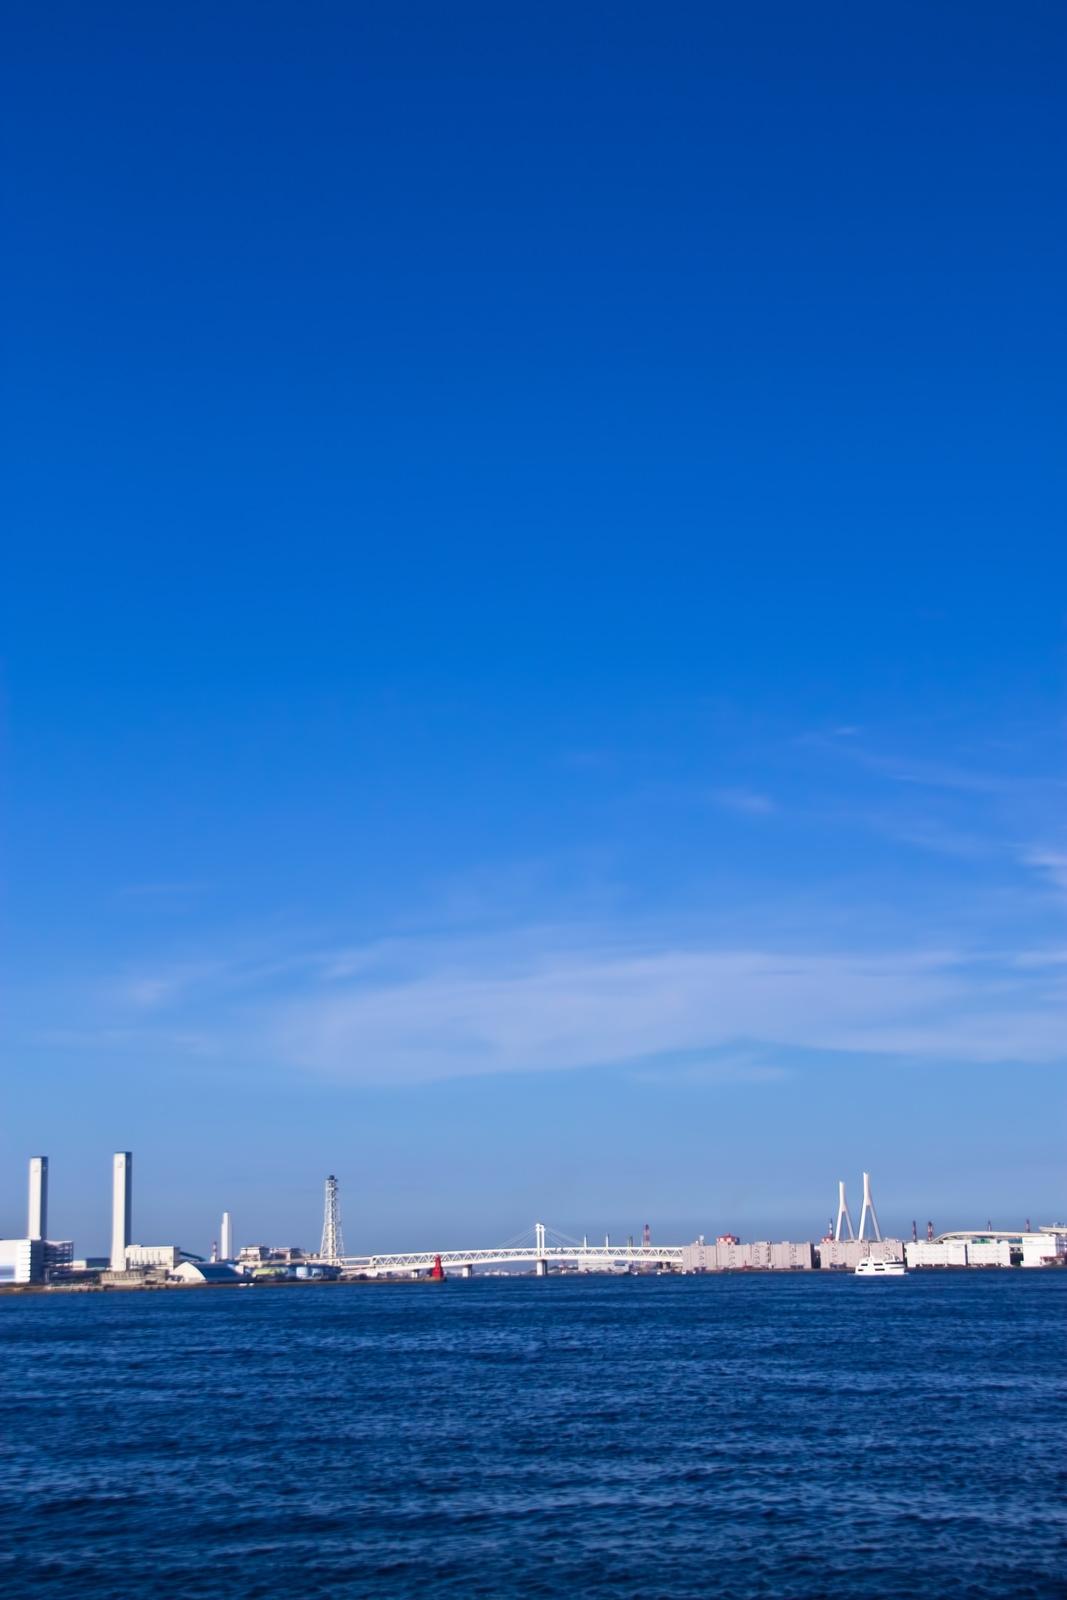 横浜の海と青空横浜の海と青空